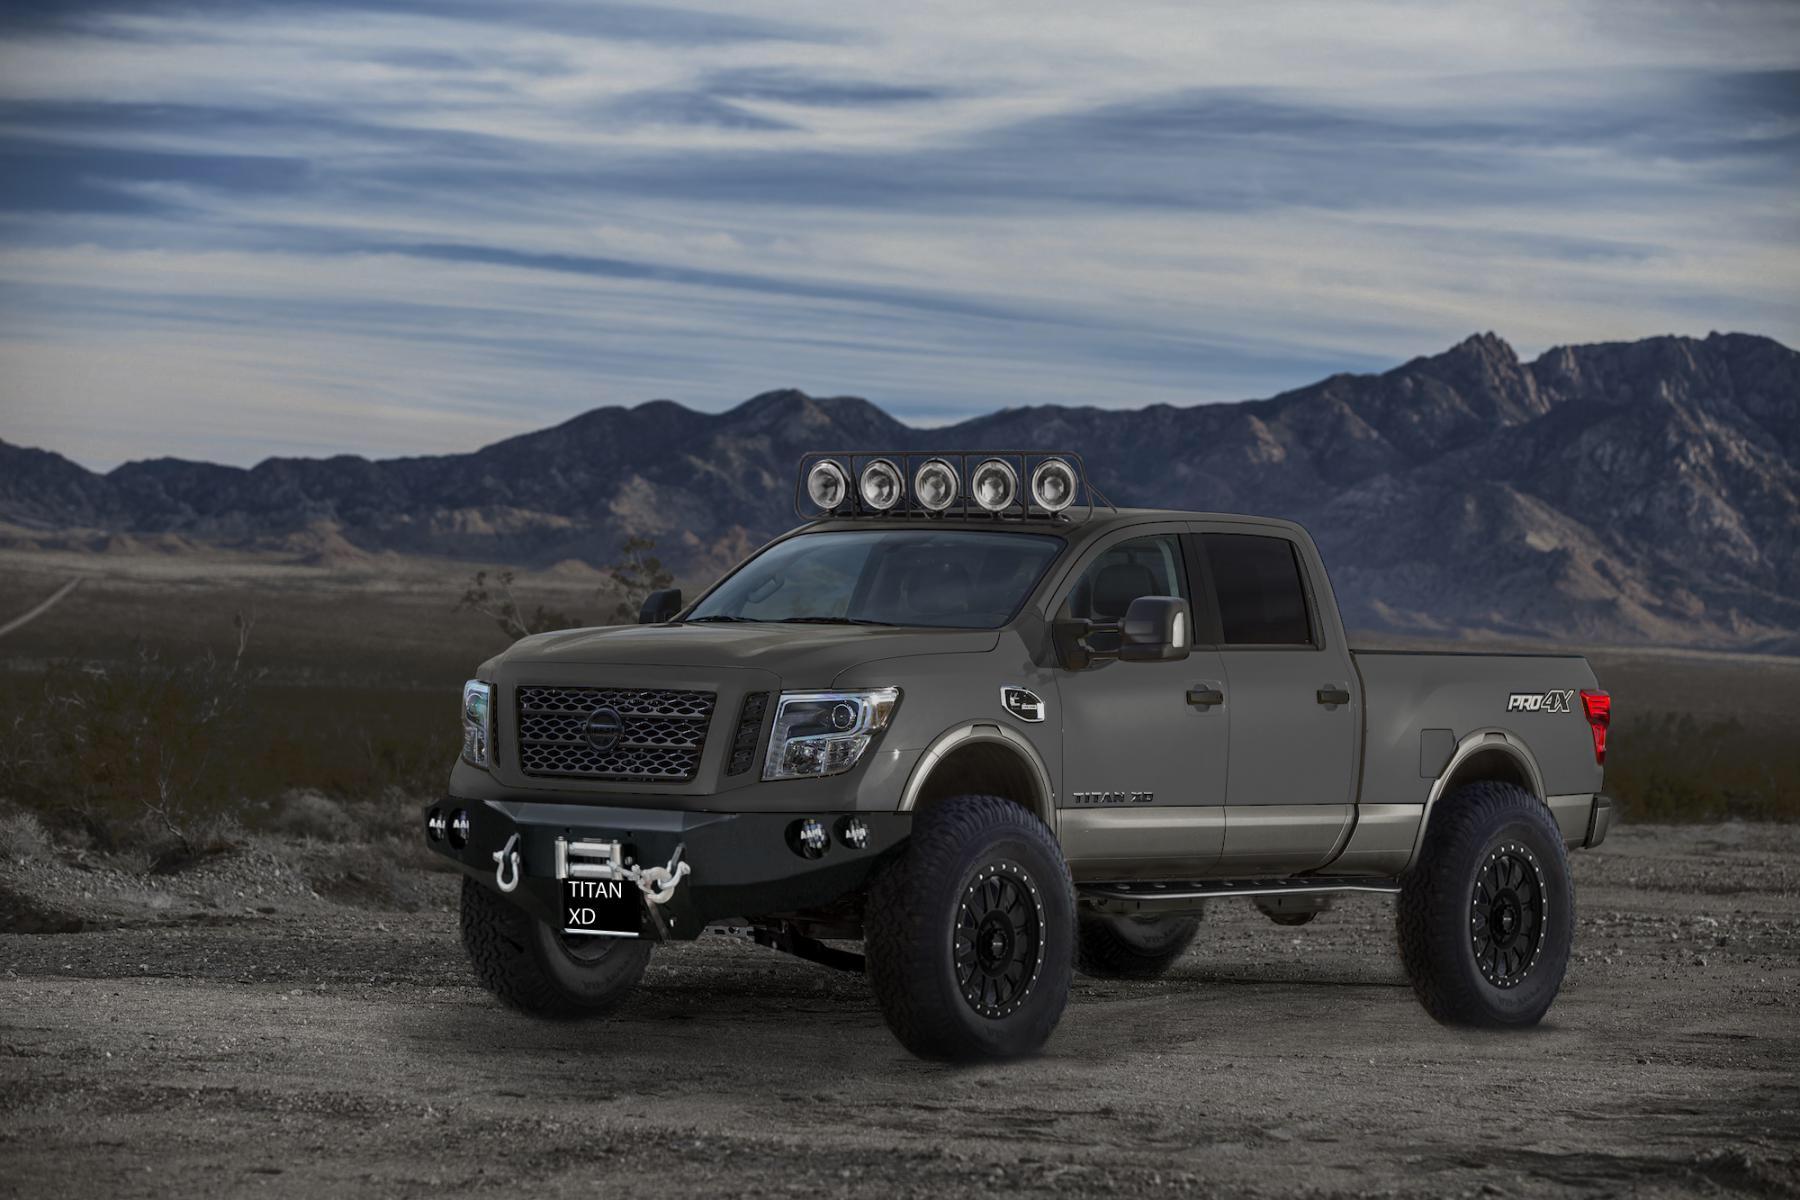 Lifted Titan Xd >> Lifted Titan XD - Nissan Titan Forum